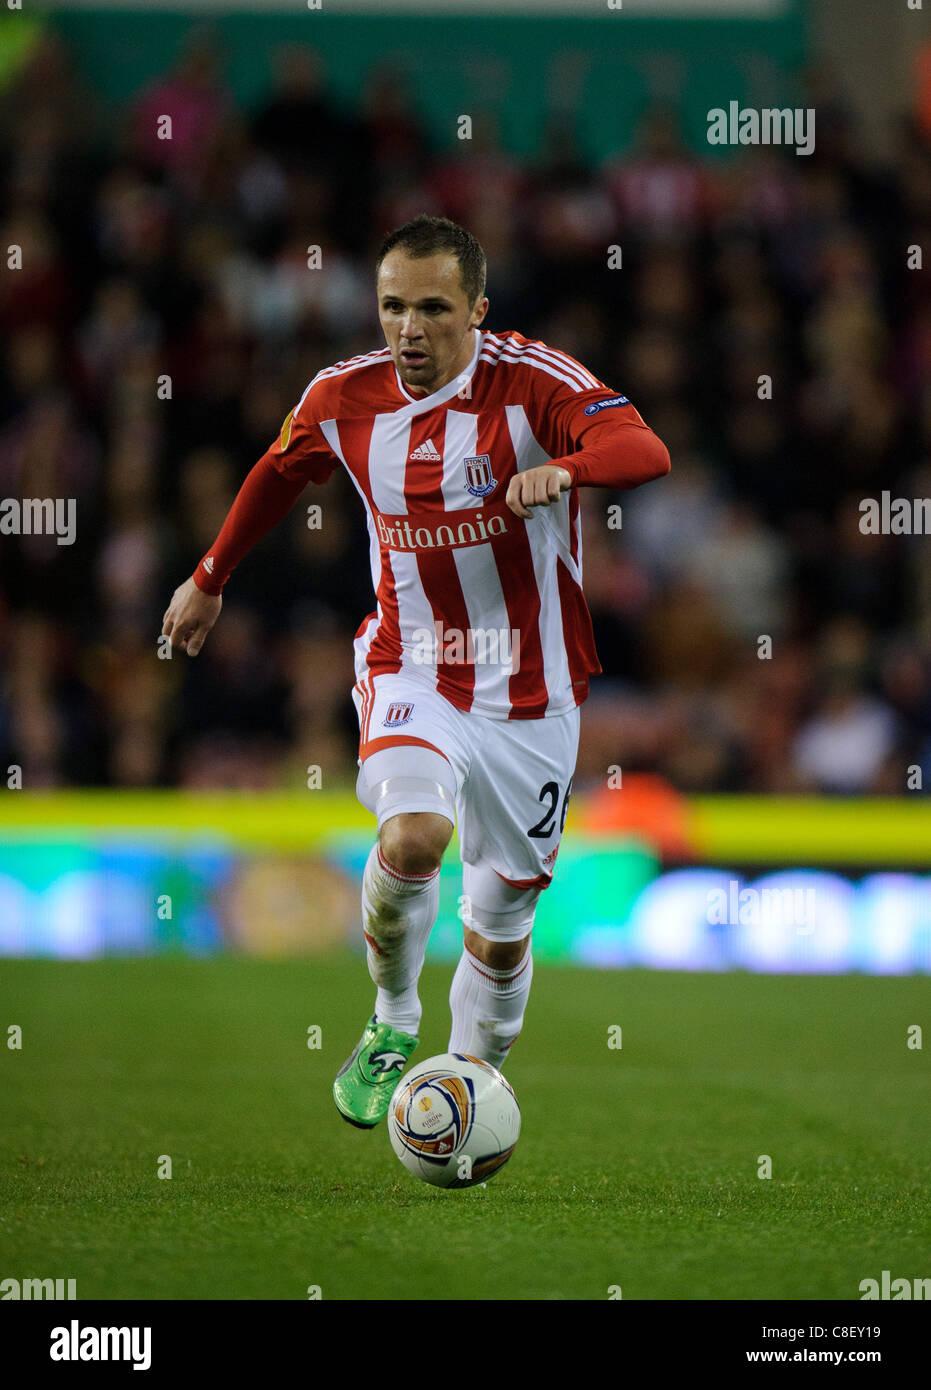 Matthew Etherington of Stoke City - Stock Image